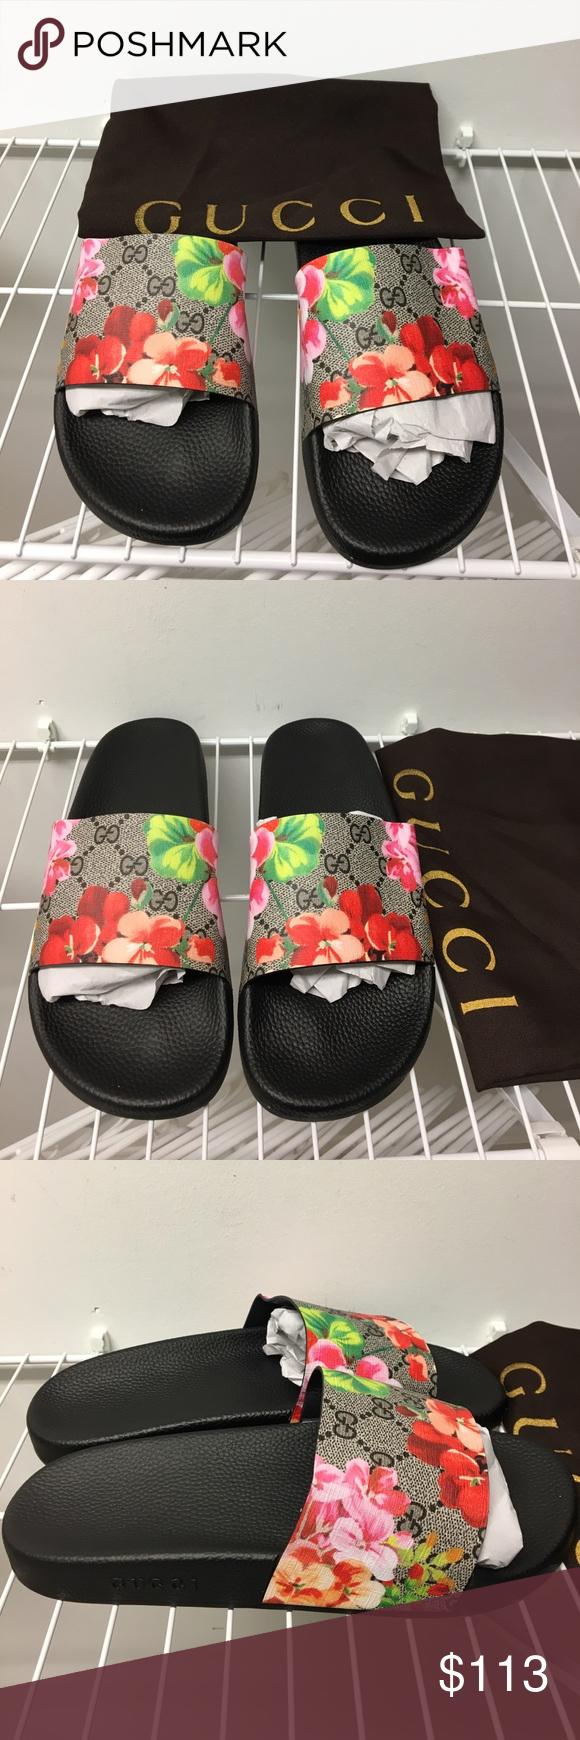 172dc2386 Gucci flip flop slides size 10 New never worn size 10 no box price firm  Shoes Sandals   Flip-Flops